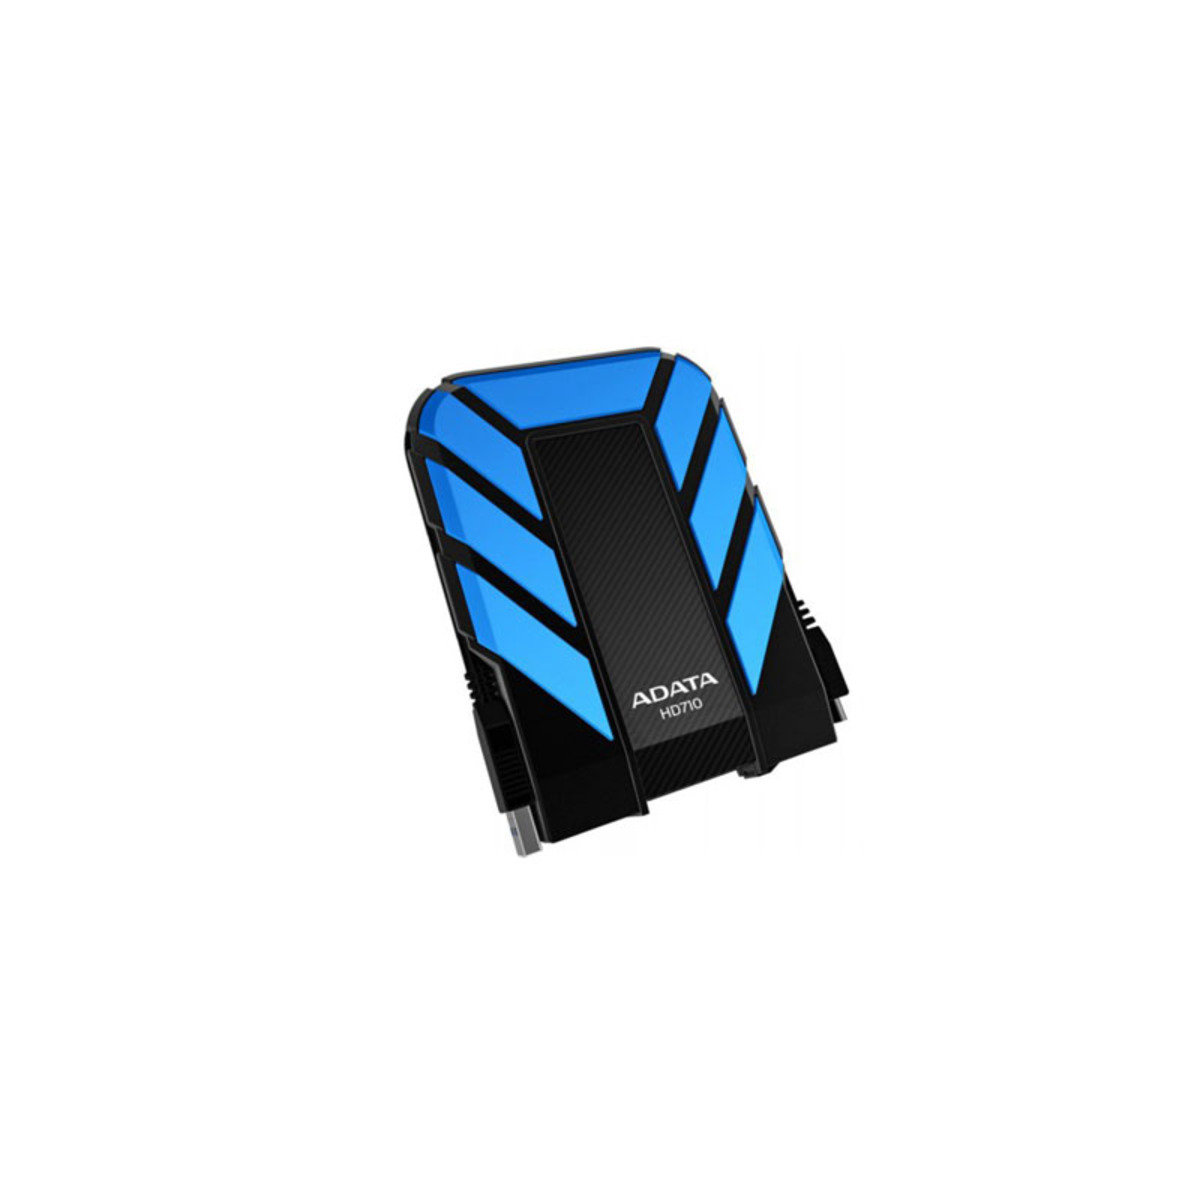 IP68 防水、防塵、抗震 USB 3.0 外置硬碟 HD710 2TB 藍色